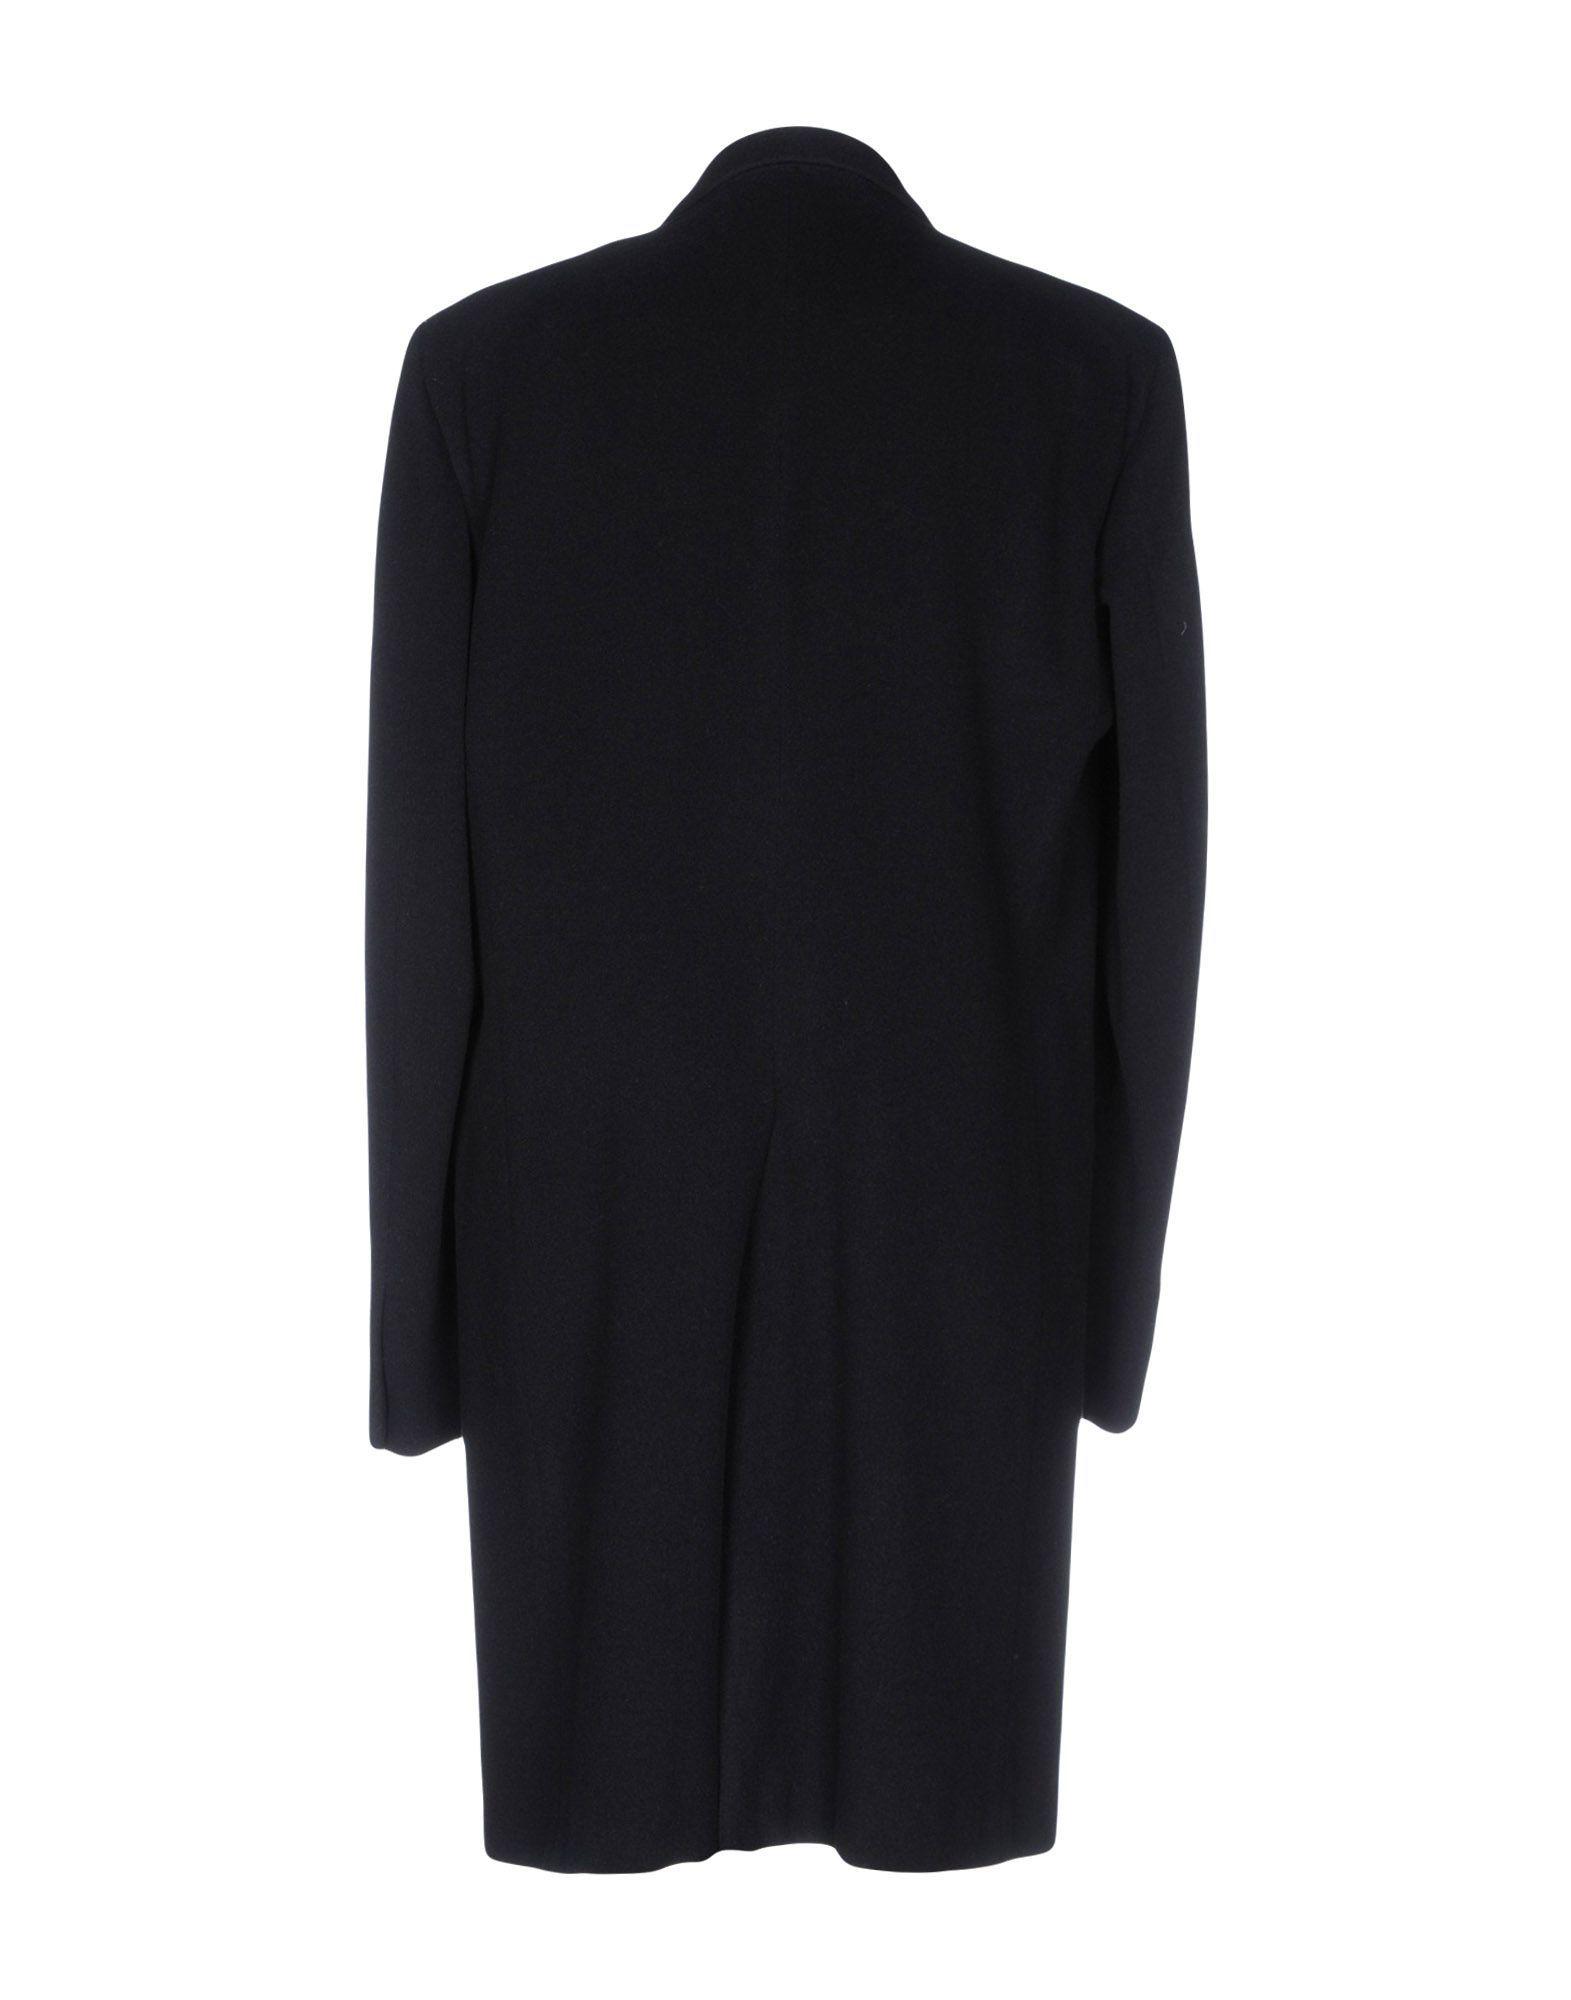 Jil Sander Dark Blue Wool Overcoat